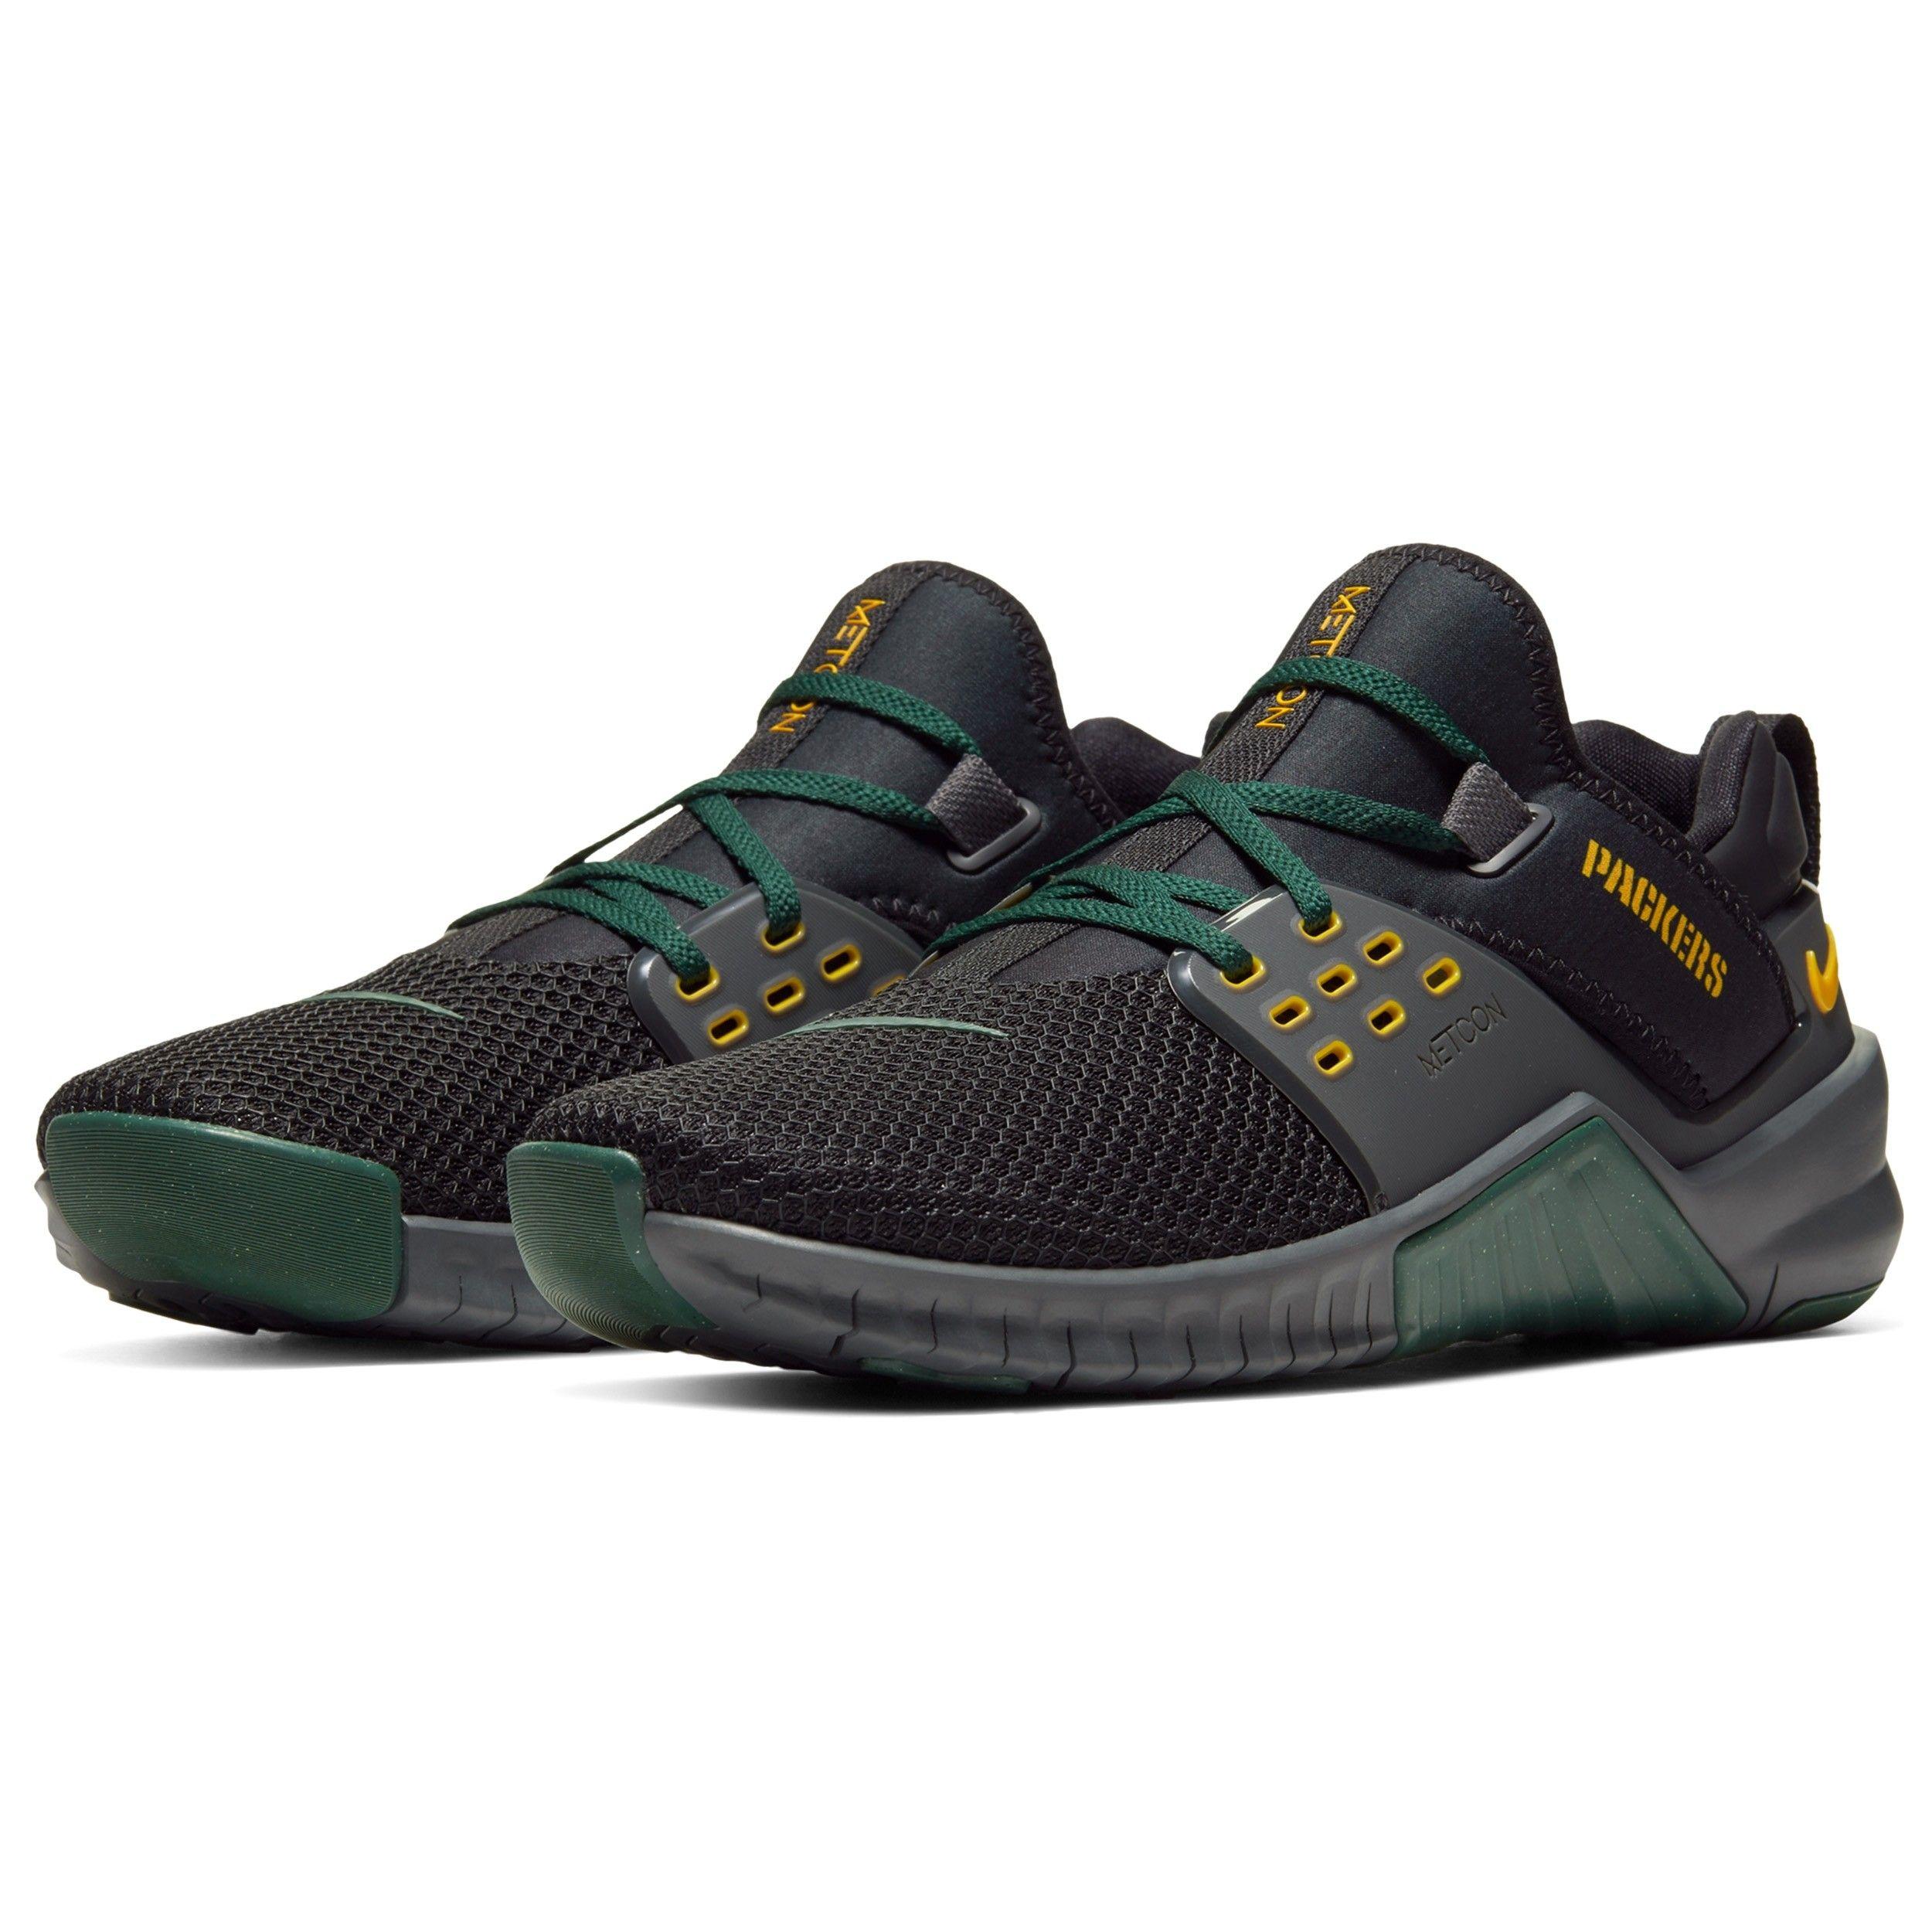 Packers Nike Free Metcon 2 Shoe Nike Free Metcon Nike